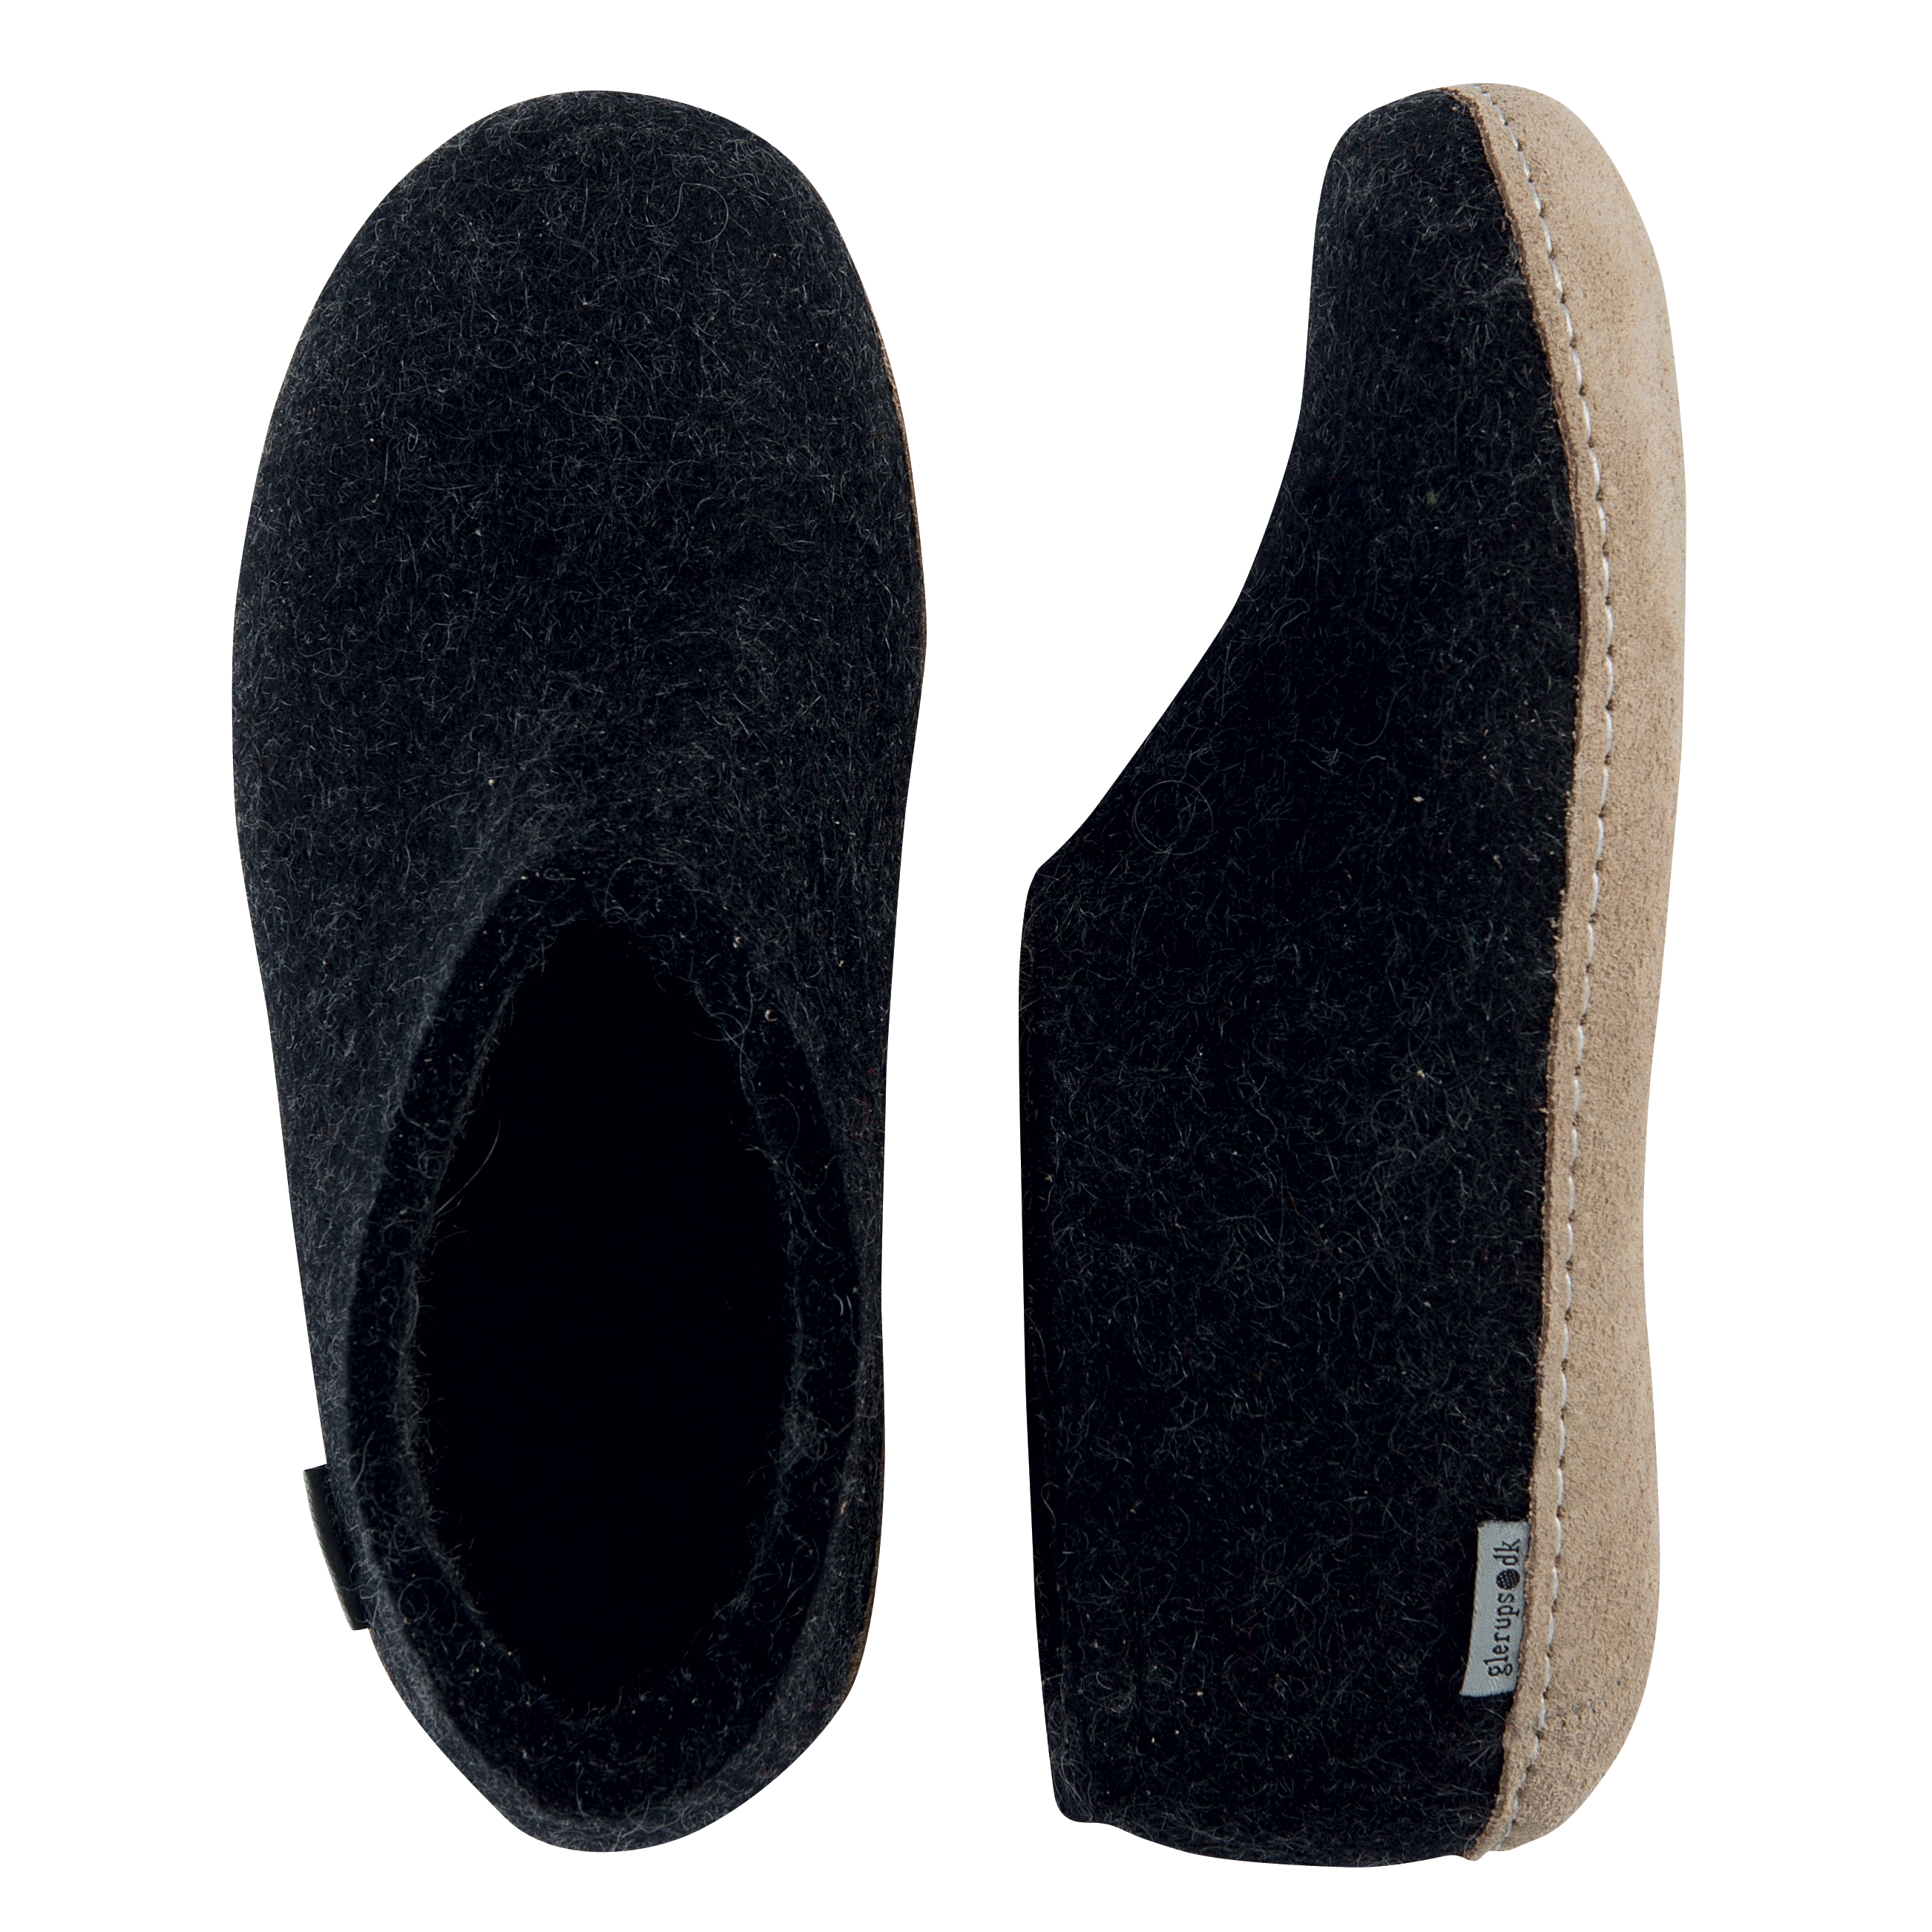 87ed5106f086a Glerups The Shoe | Huckberry